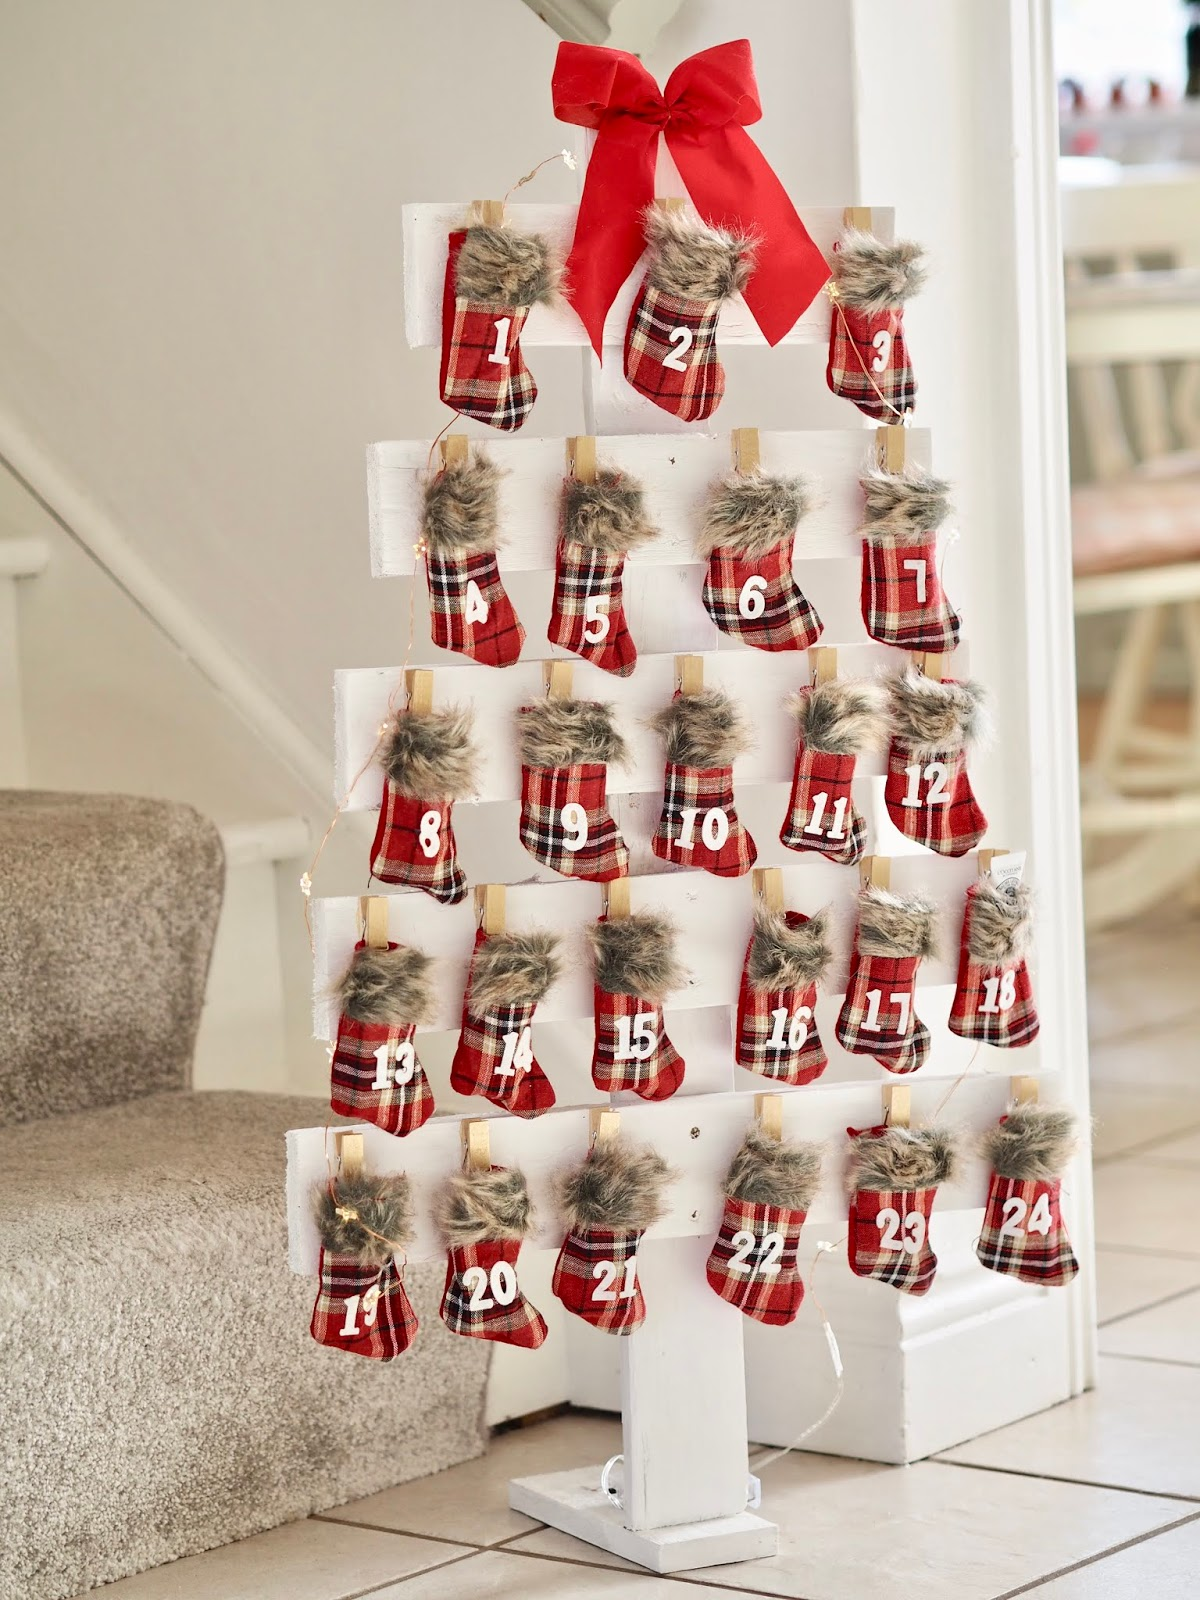 Diy Christmas Tree Advent Calendar From Palette Wood Dainty Dress